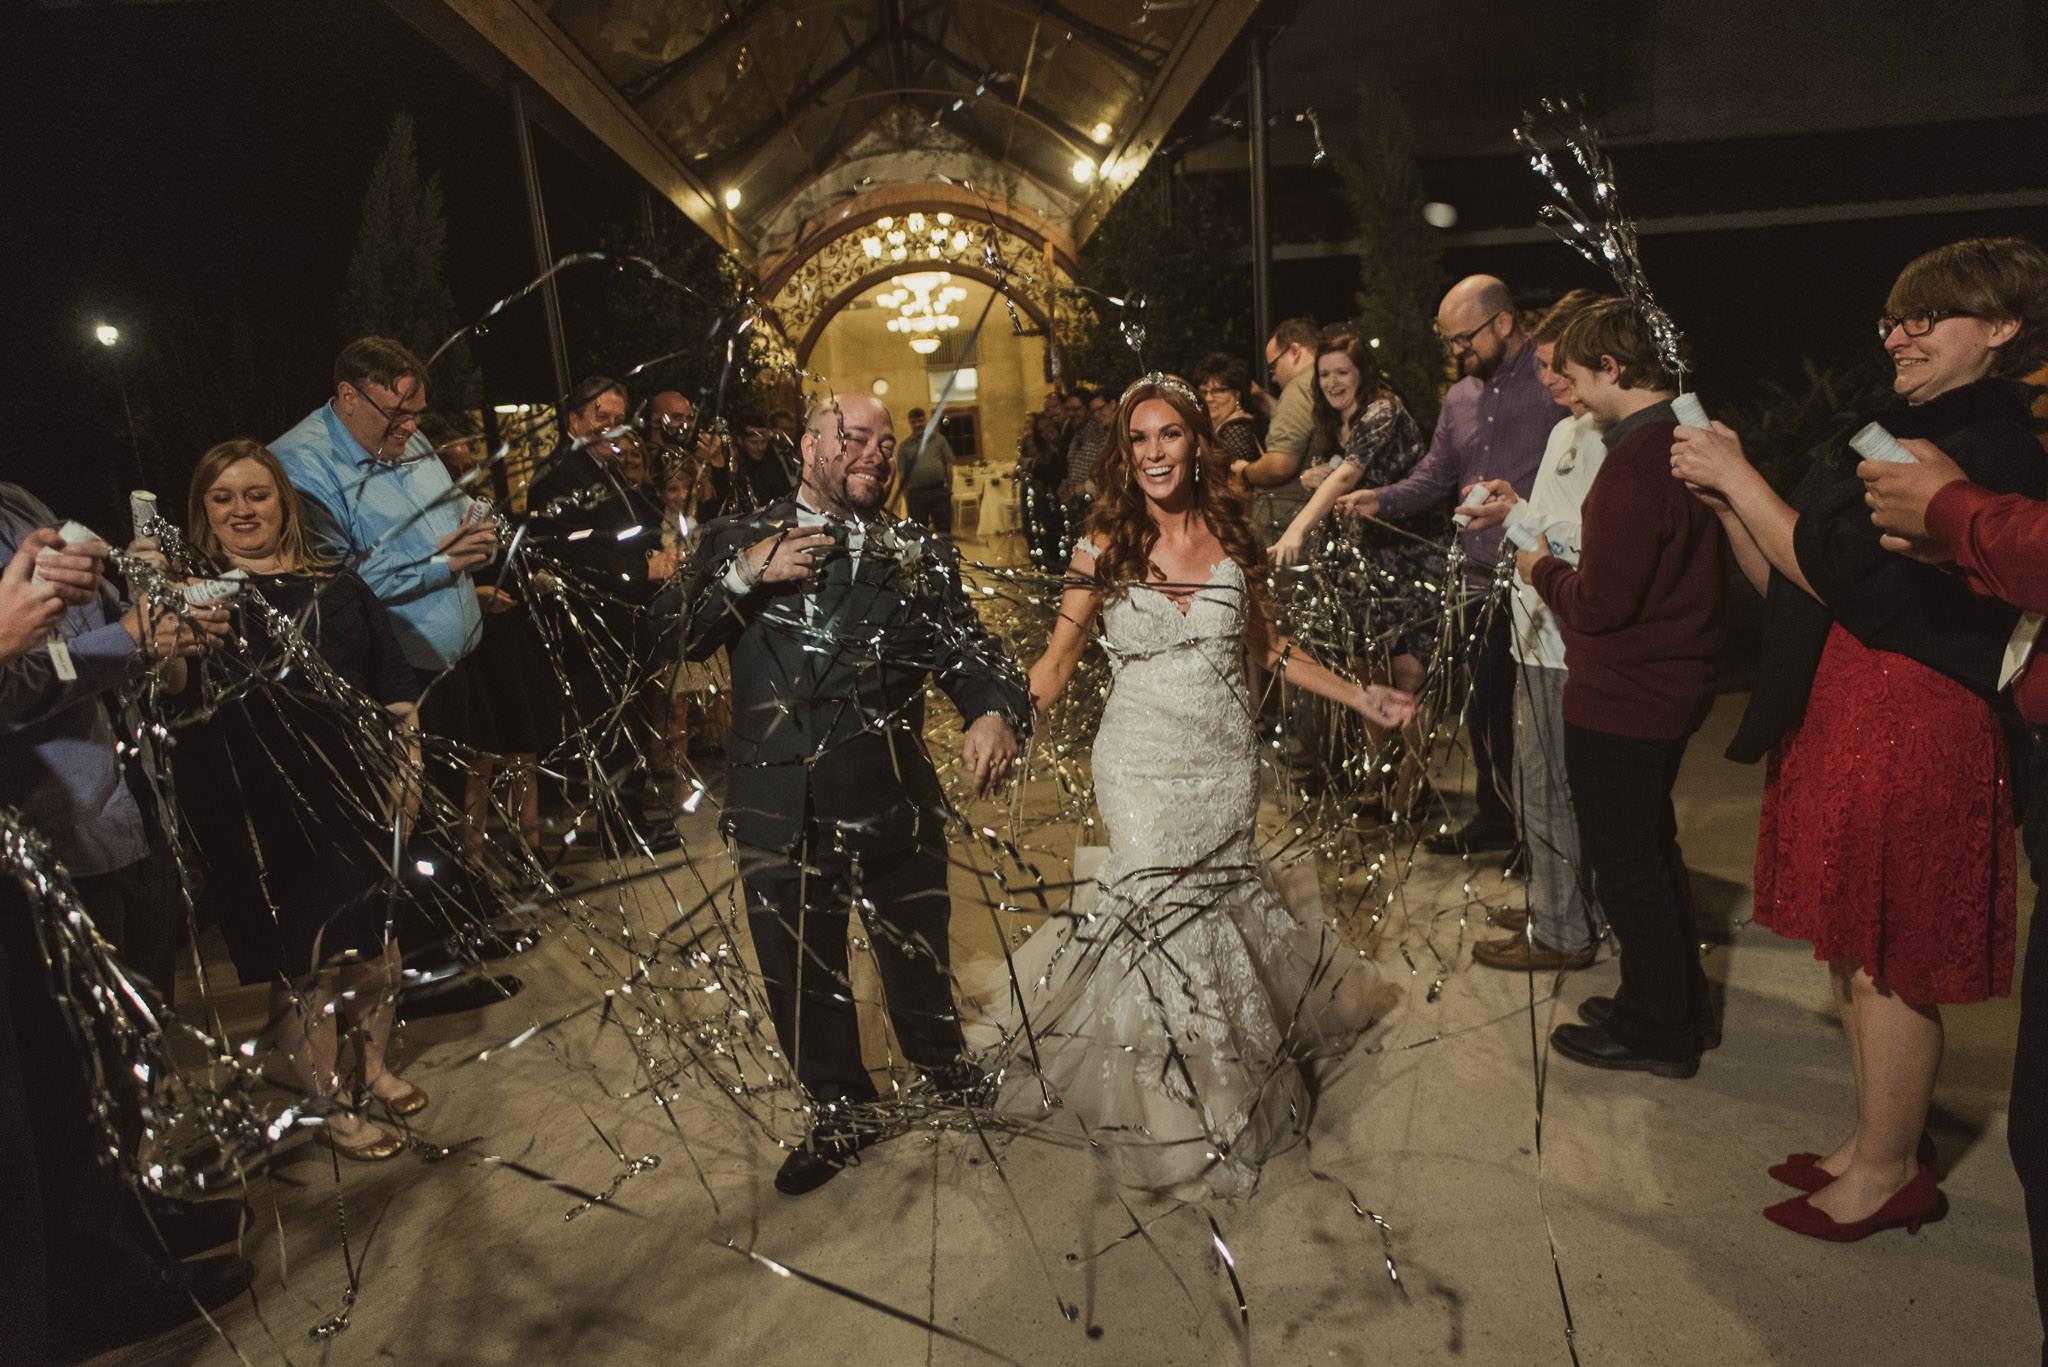 Cynthia-Curtis-Olde-Dobbine-Station-Houston-Wedding-Photographer-sm-93.jpg